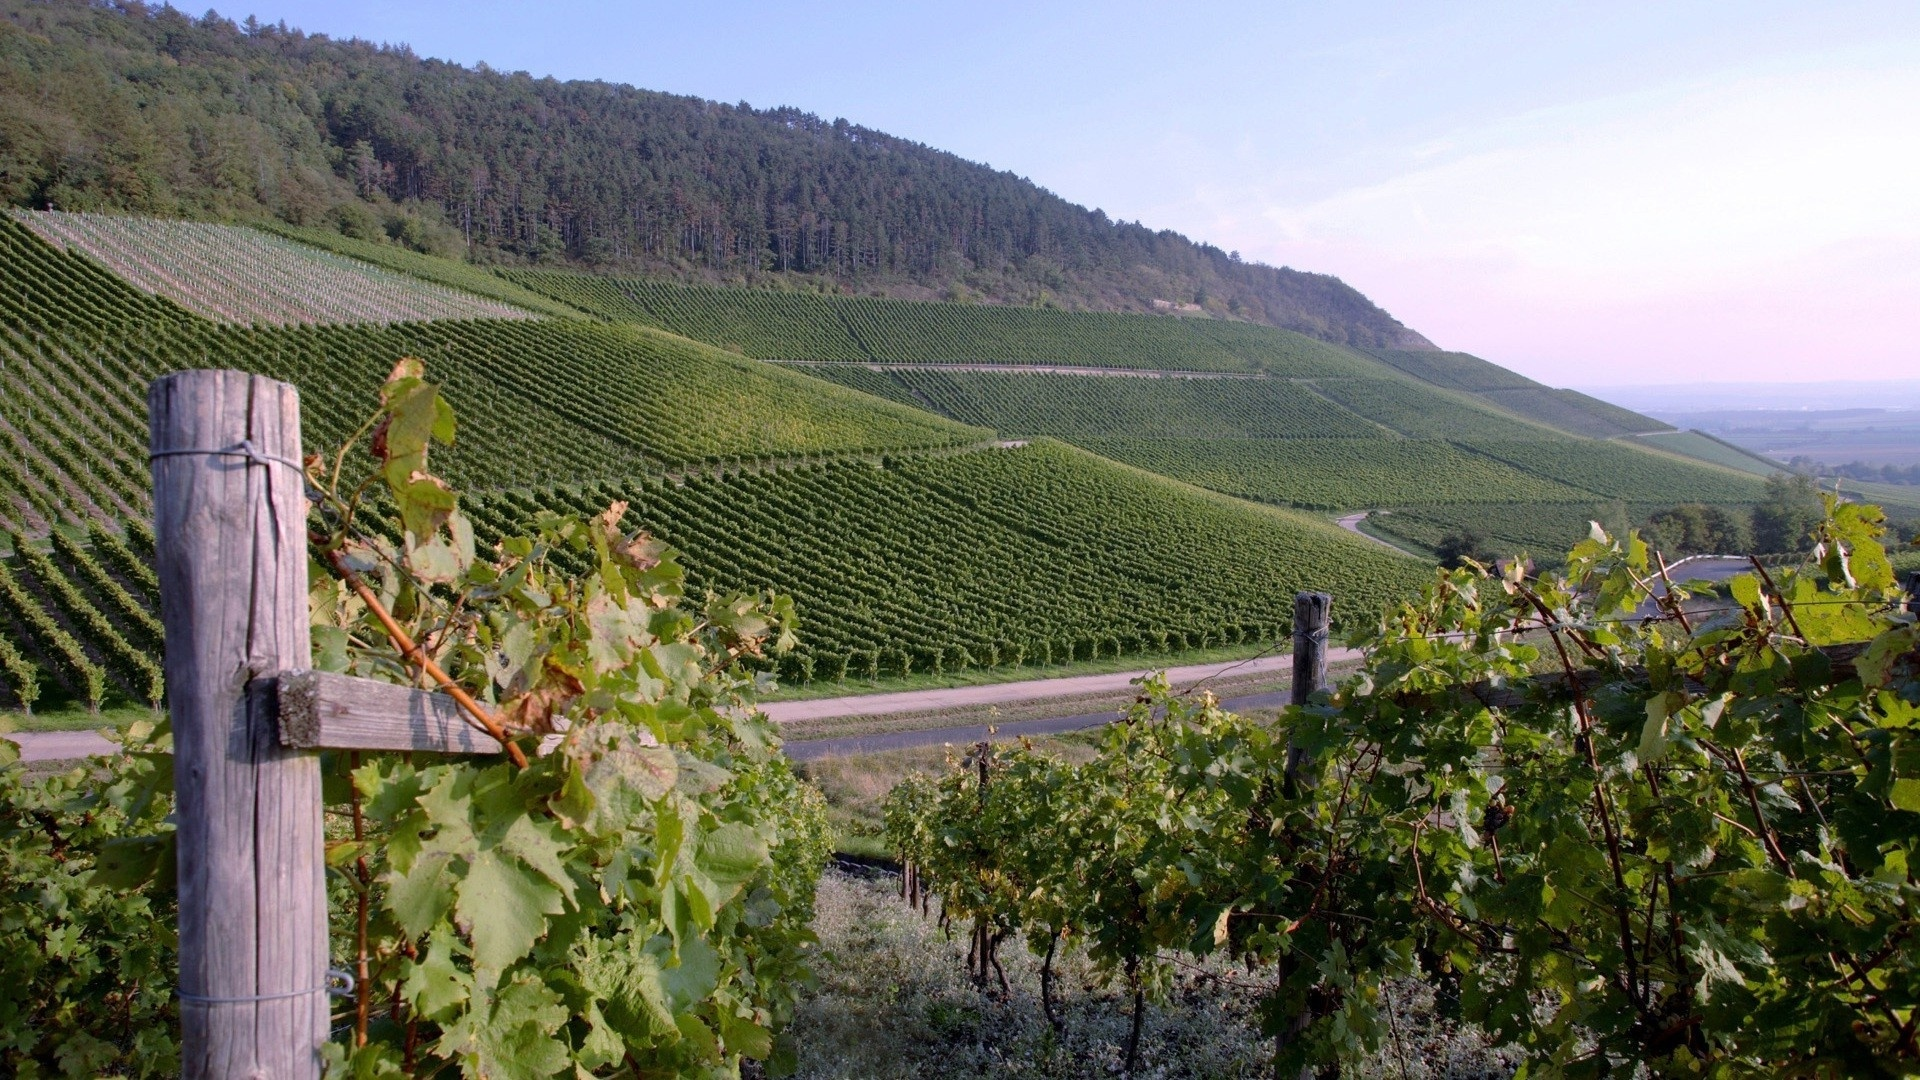 Vineyard cool background